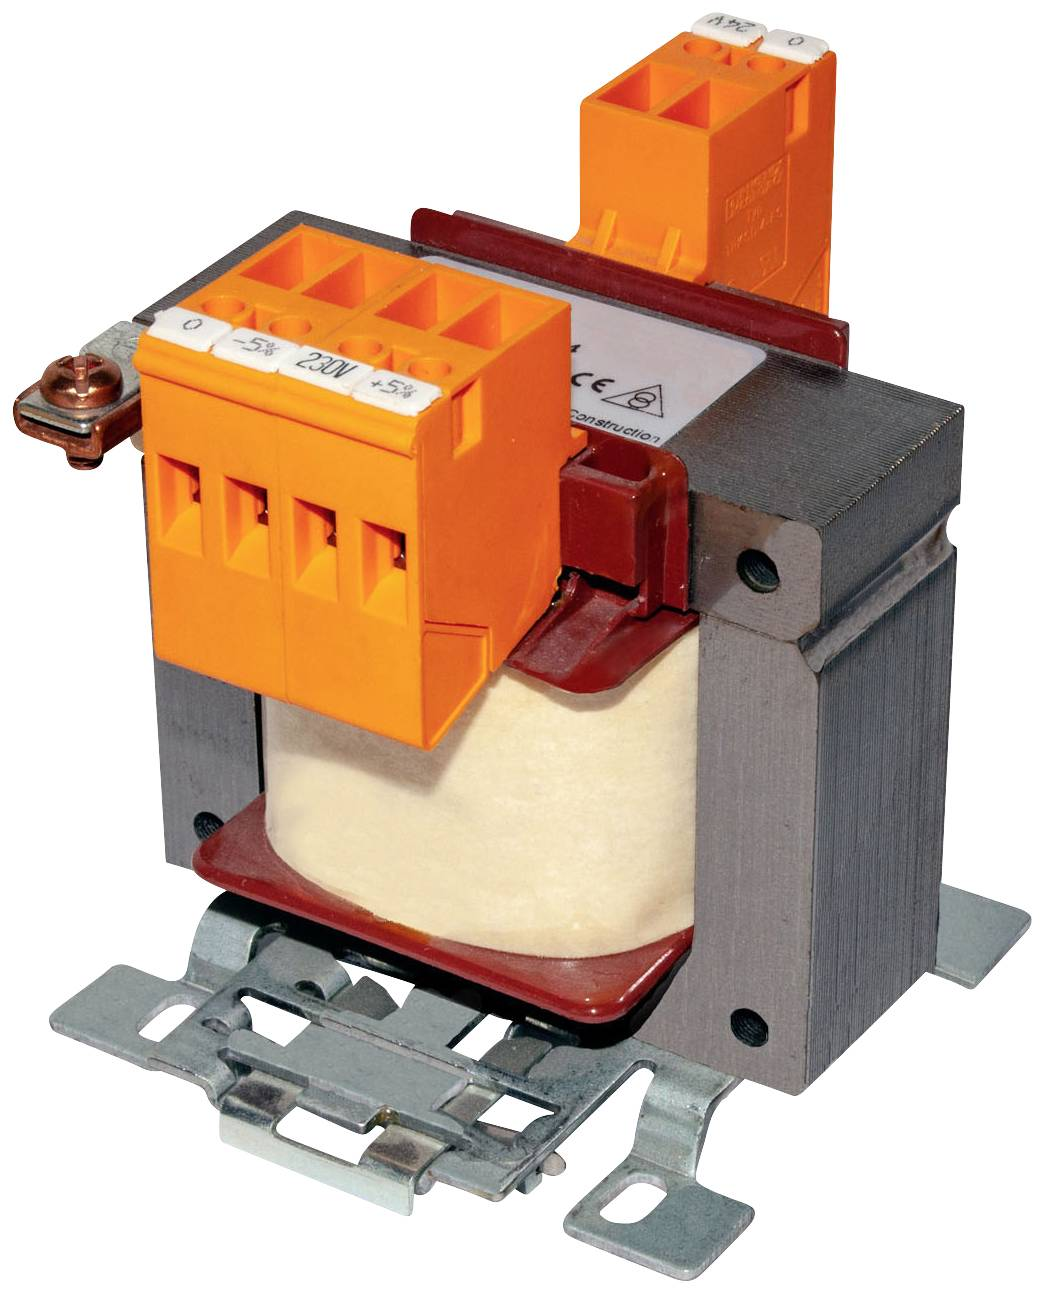 Riadiaci transformátor Weiss Elektrotechnik WUSTTR 63/1124, 63 VA